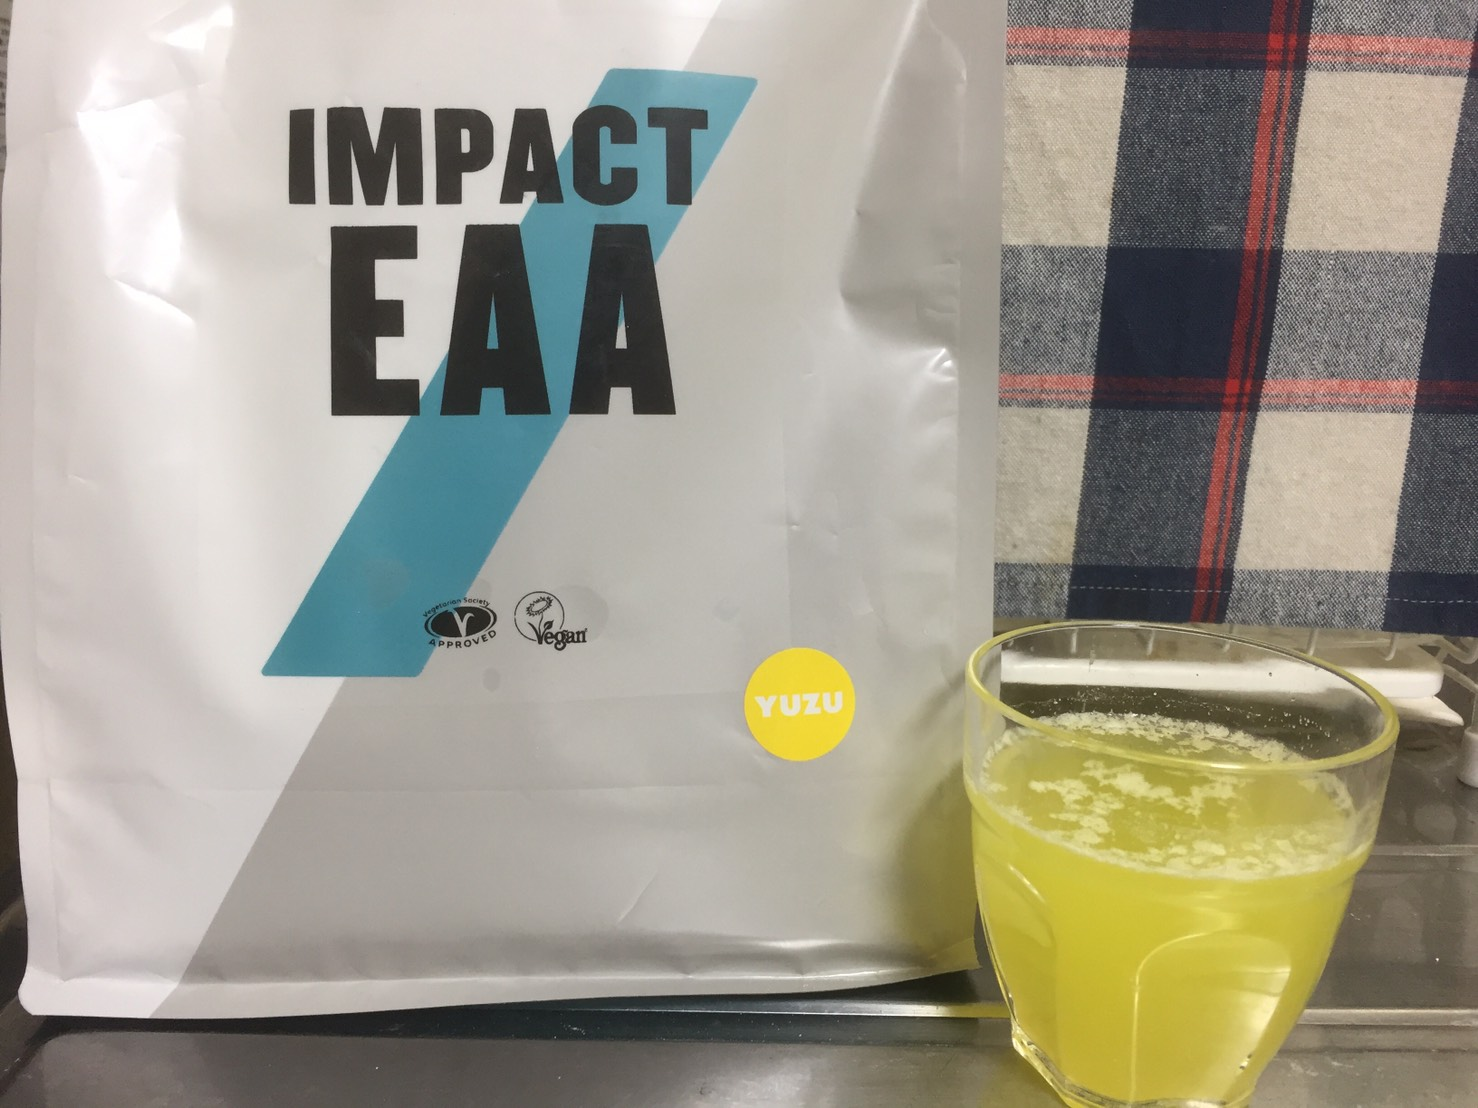 Impact EAAゆず味のレビュー